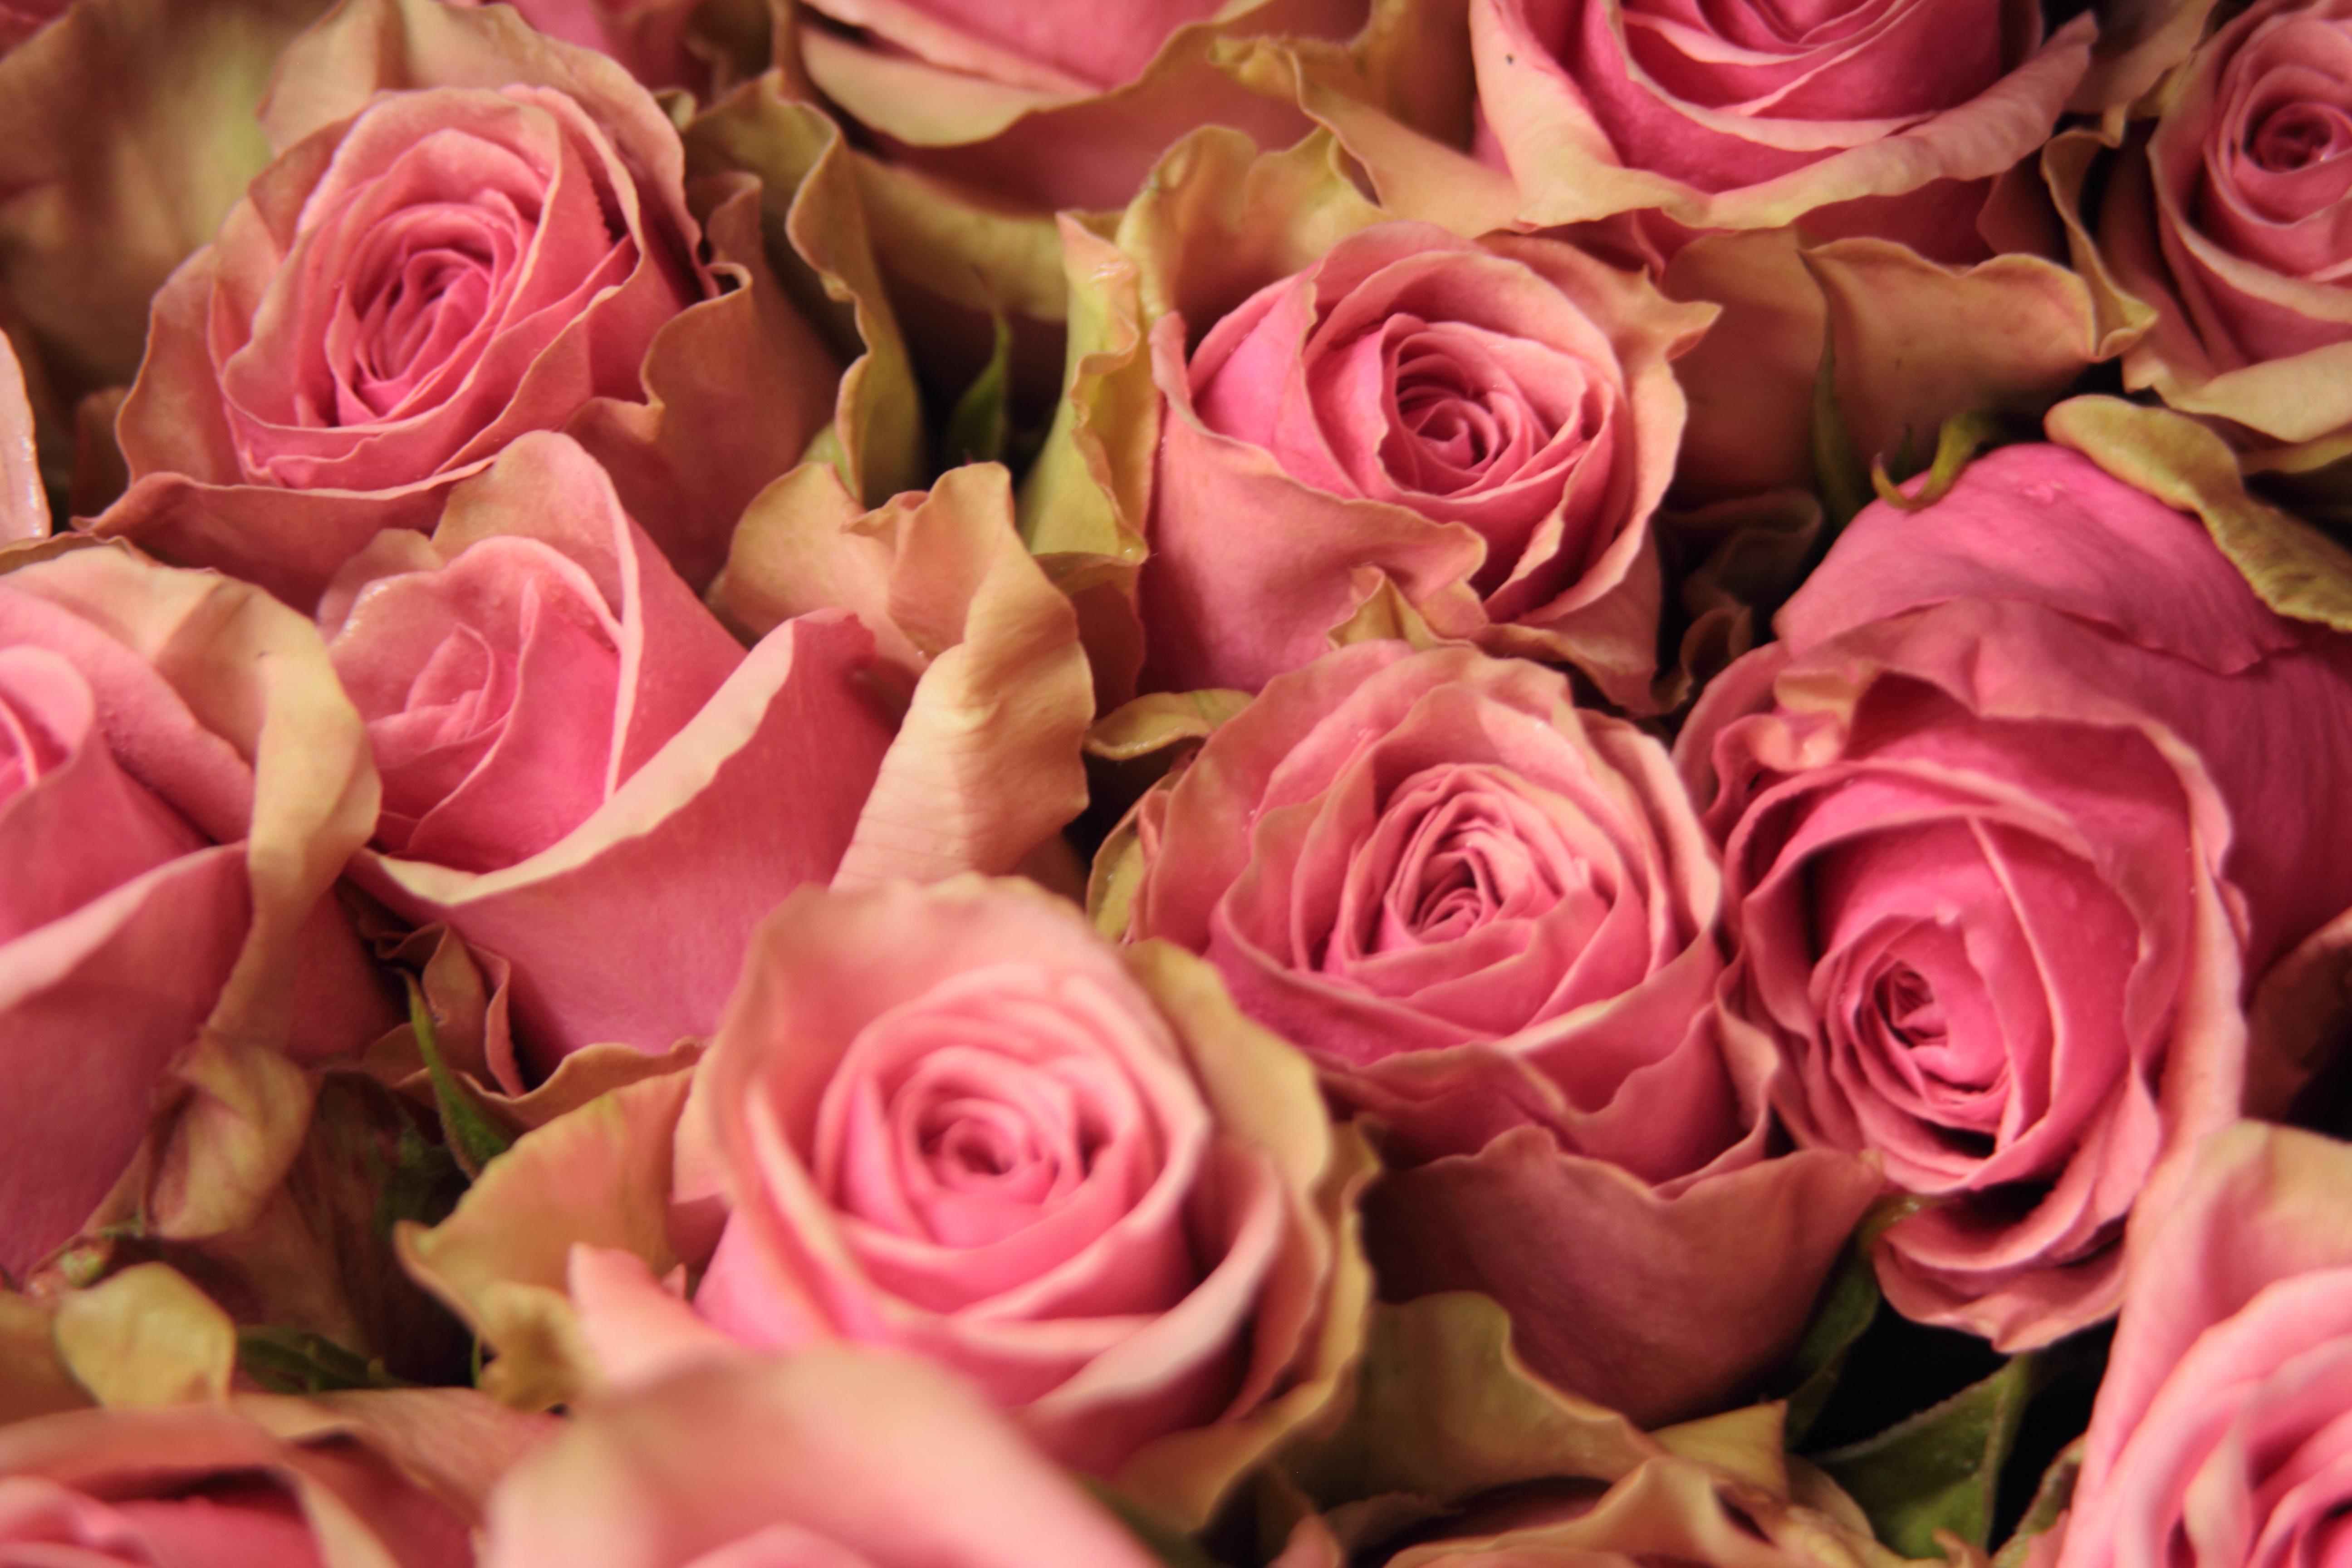 26 Ecuadorian Roses Varieties to Watch in the upcoming wedding season